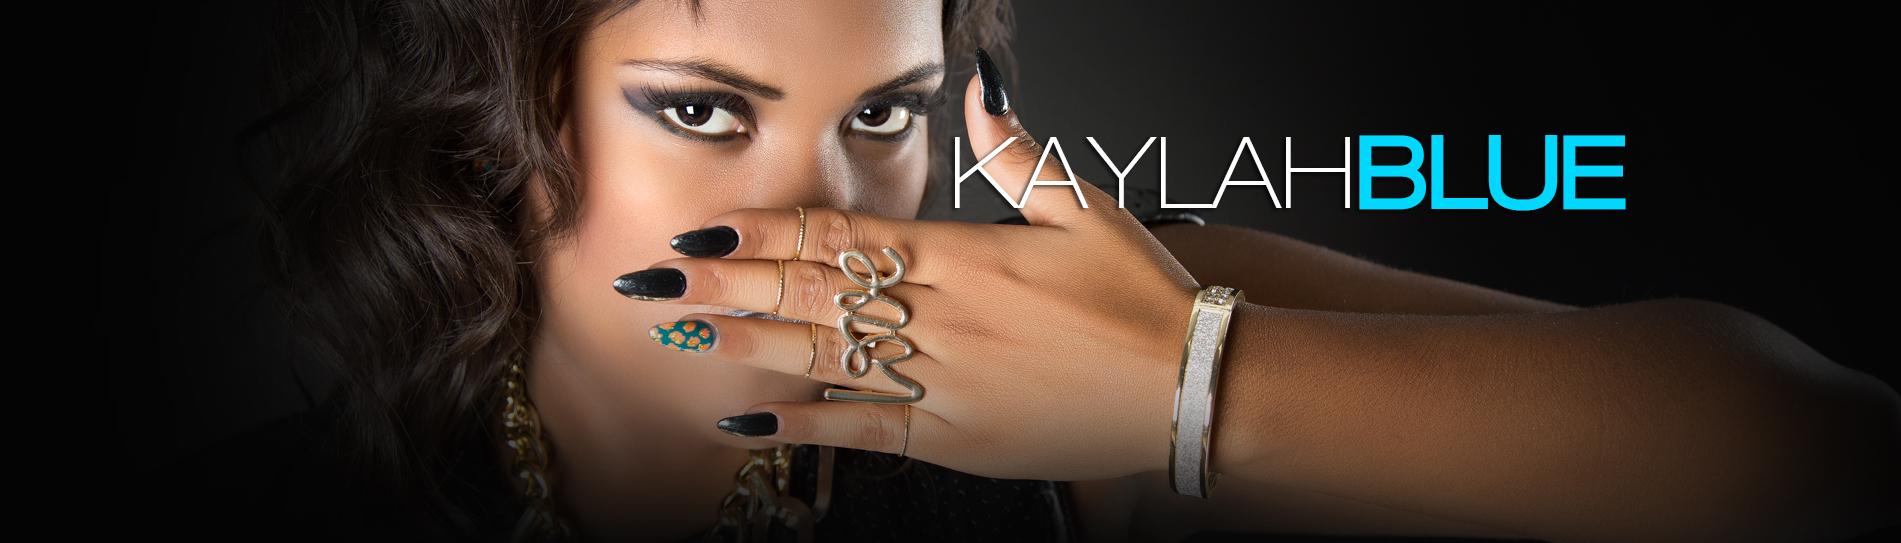 http://www.blvmusicgroup.com/wp-content/uploads/2014/09/kaylah_blue_header1.jpg